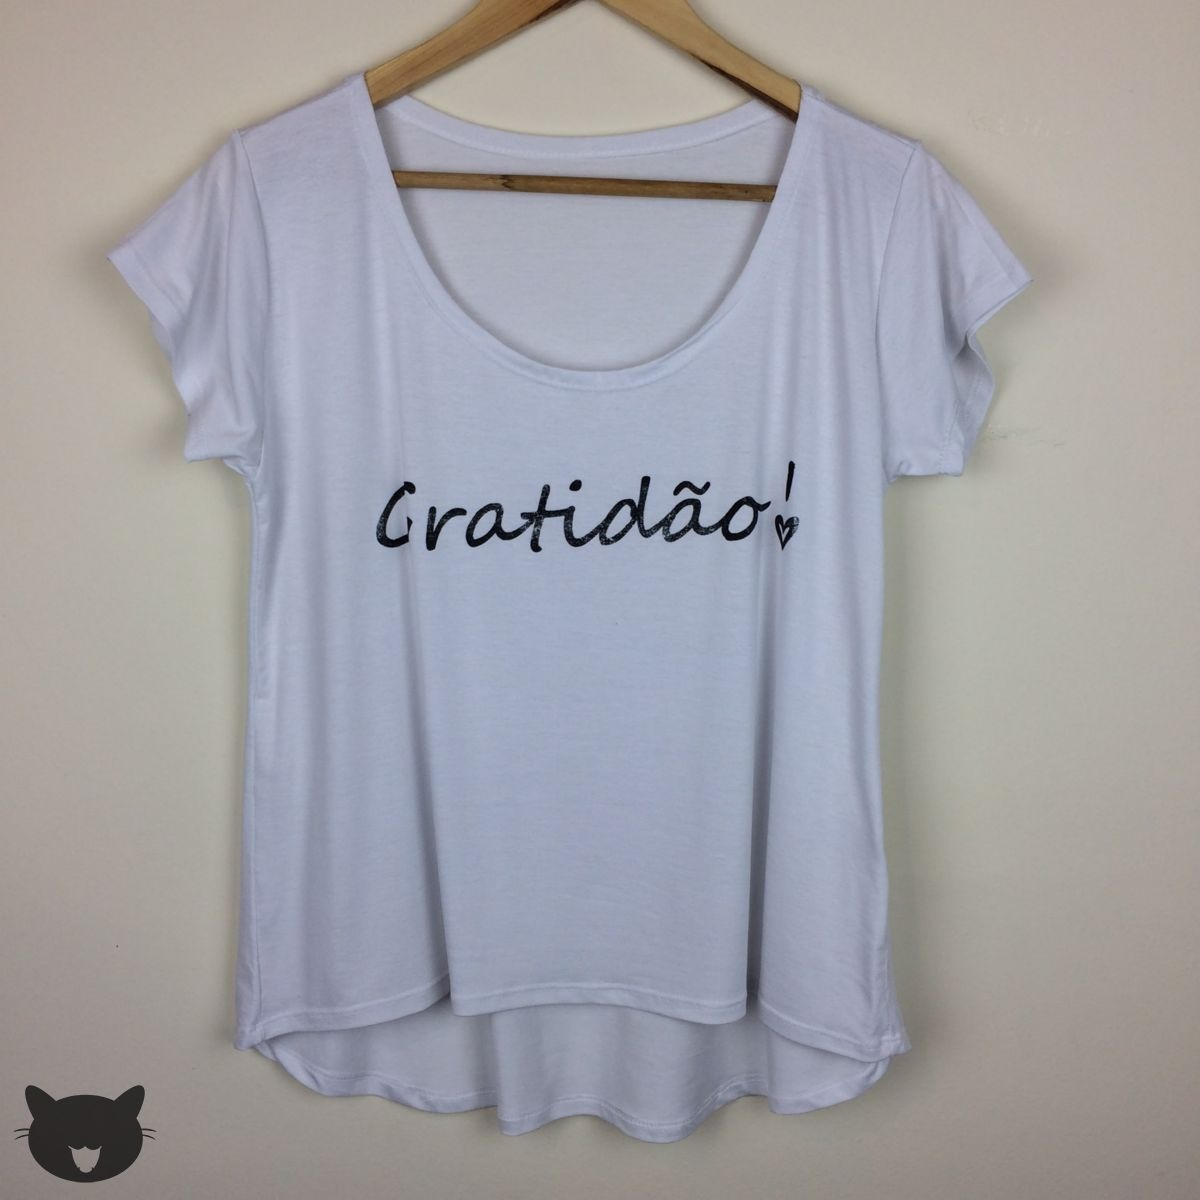 33e1943ef Camiseta T-shirt Blusa Feminina Mullet Gratidão Frase Branco - R  28 ...